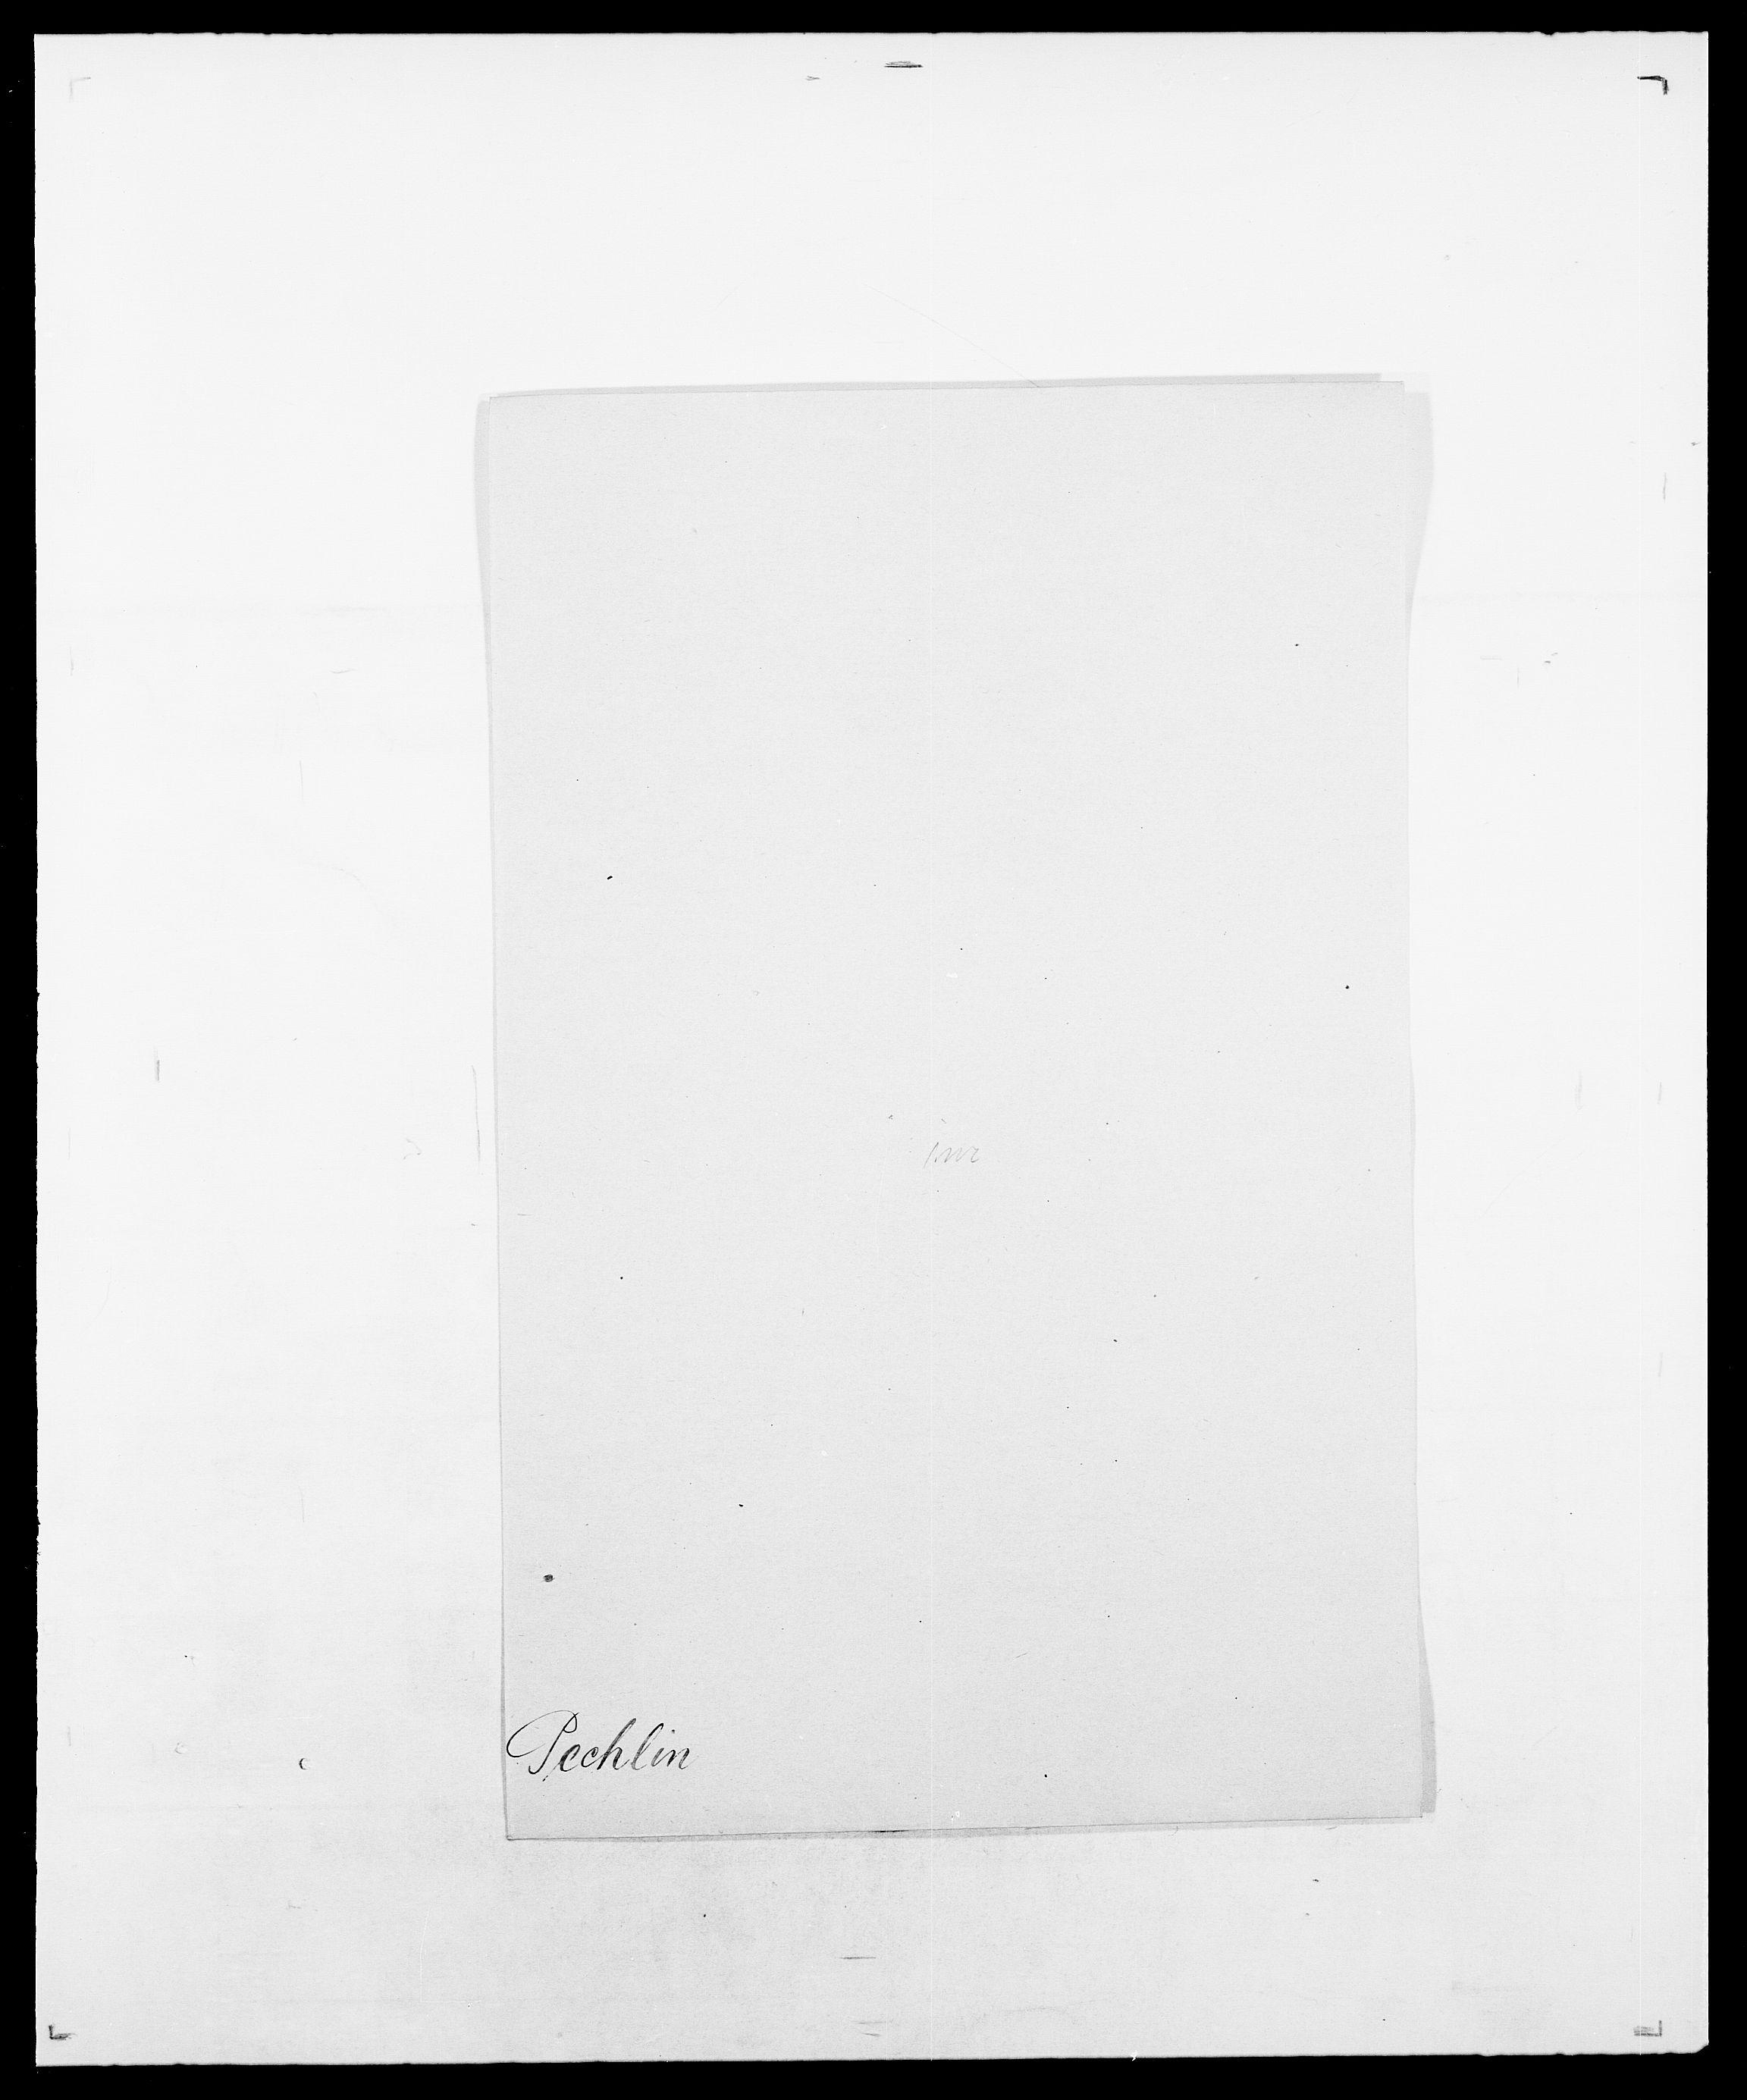 SAO, Delgobe, Charles Antoine - samling, D/Da/L0030: Paars - Pittelkov, s. 265